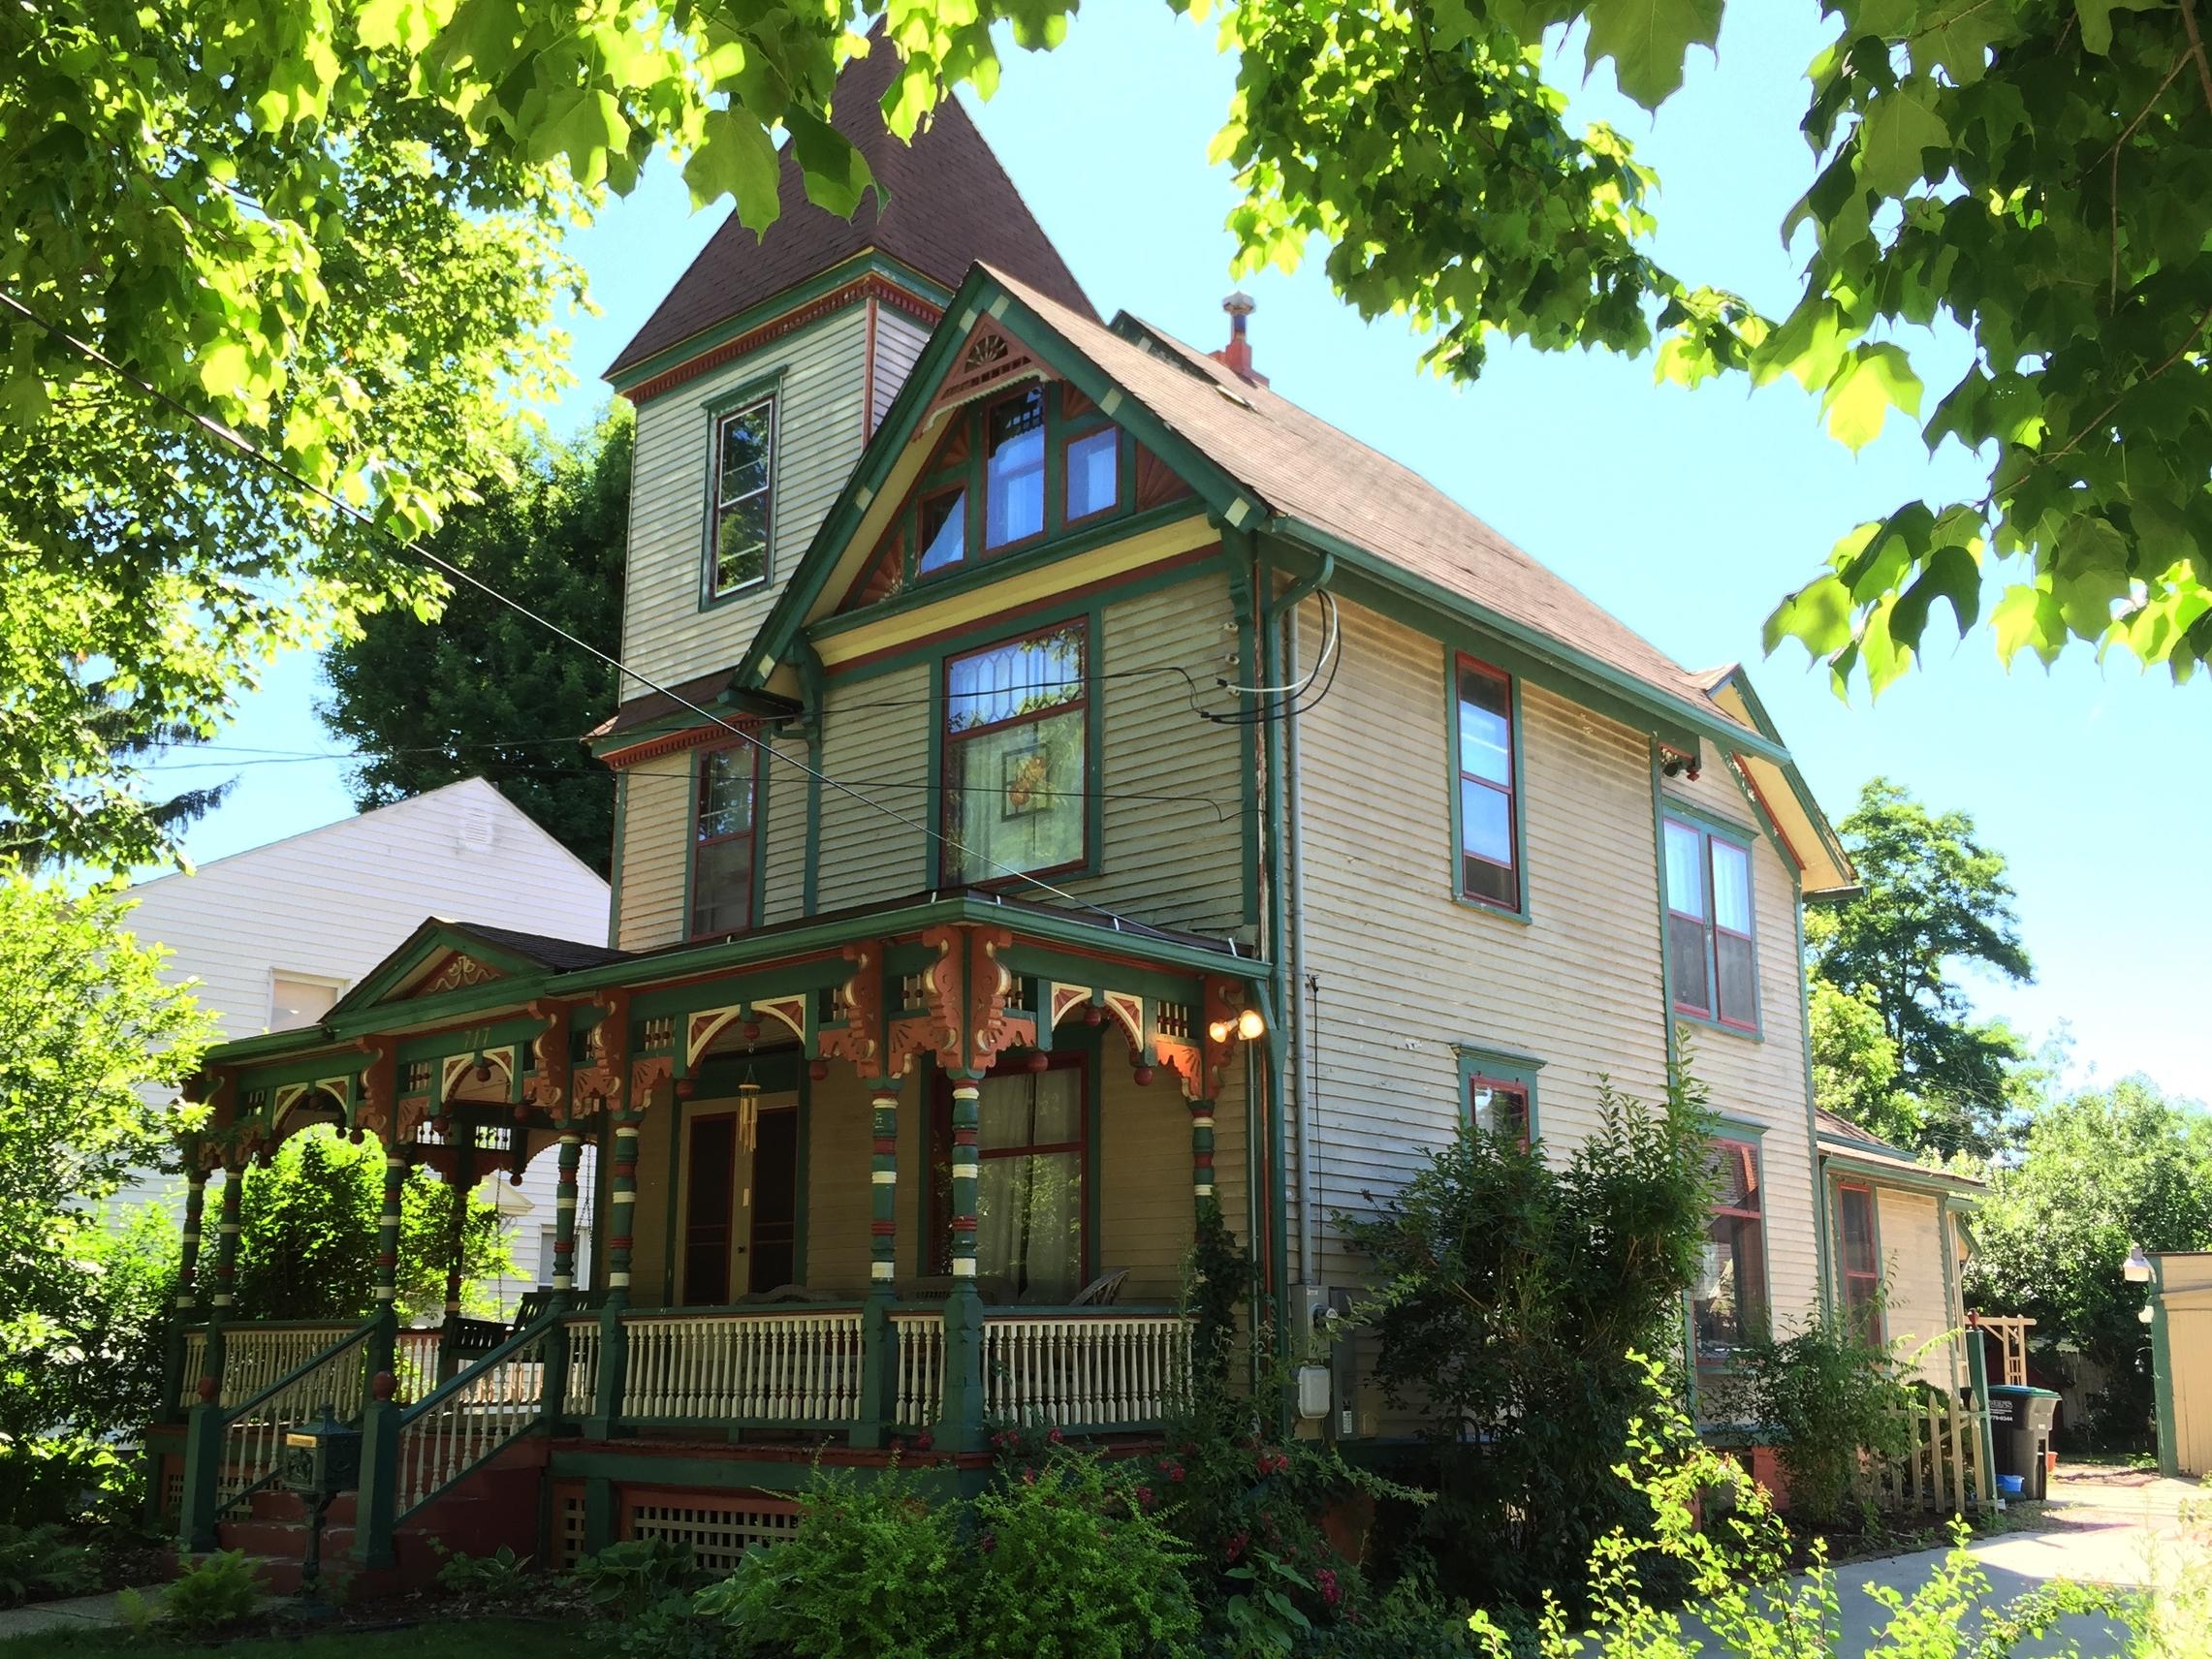 Mumaw House, 717 North Broad Street, c. 1895